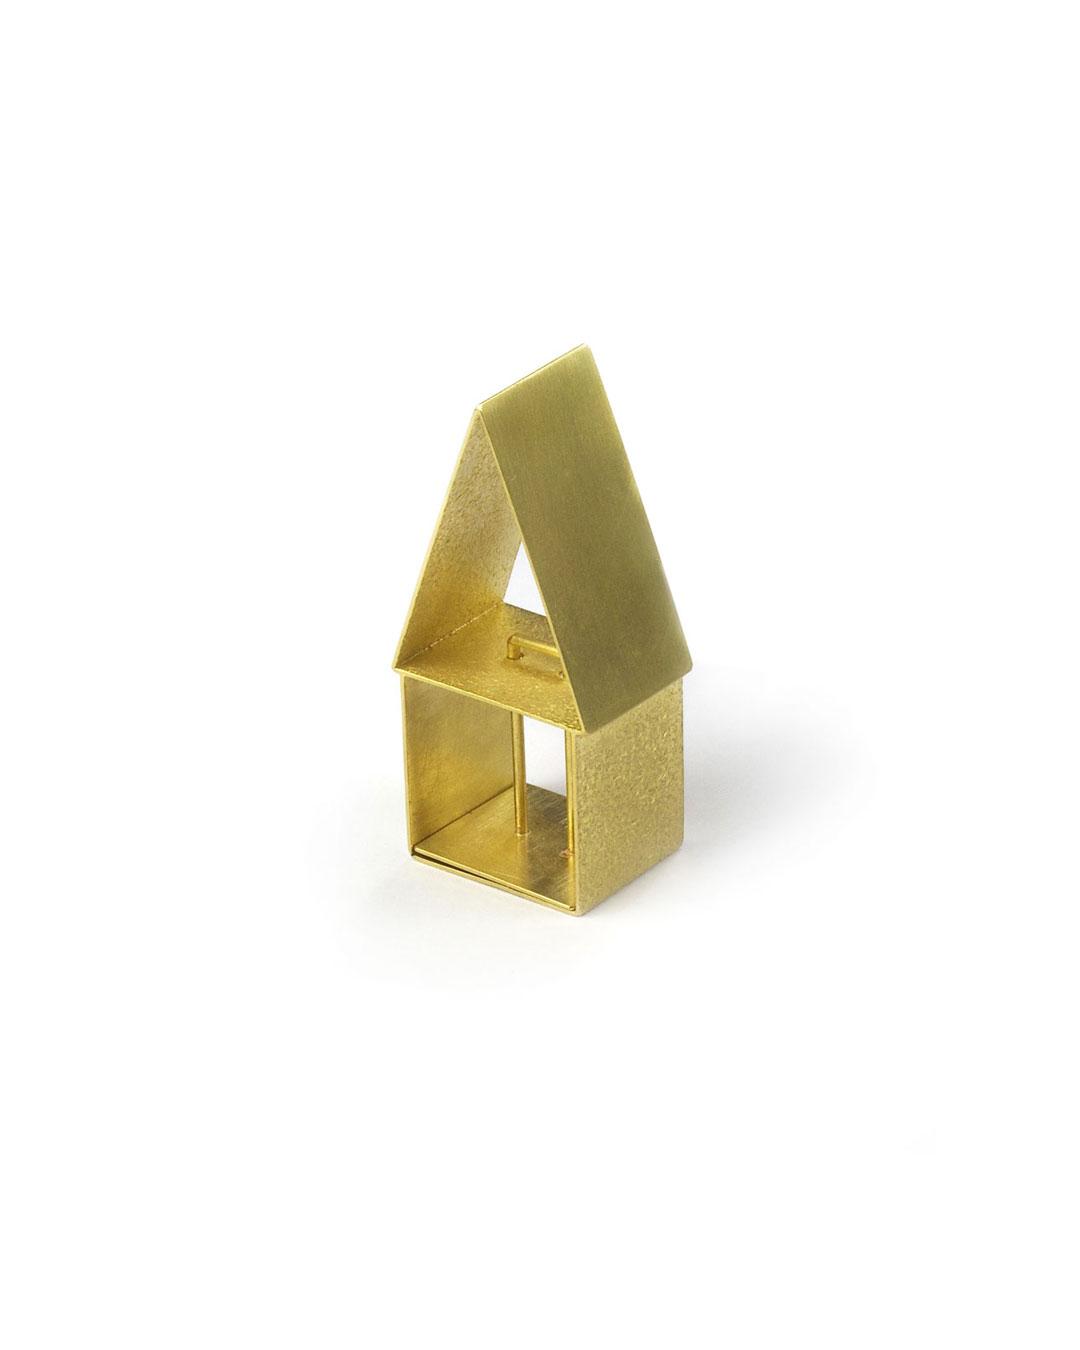 Okinari Kurokawa, untitled, 2006, ring; 20ct gold, 42 x 20 x 14 mm, €3000